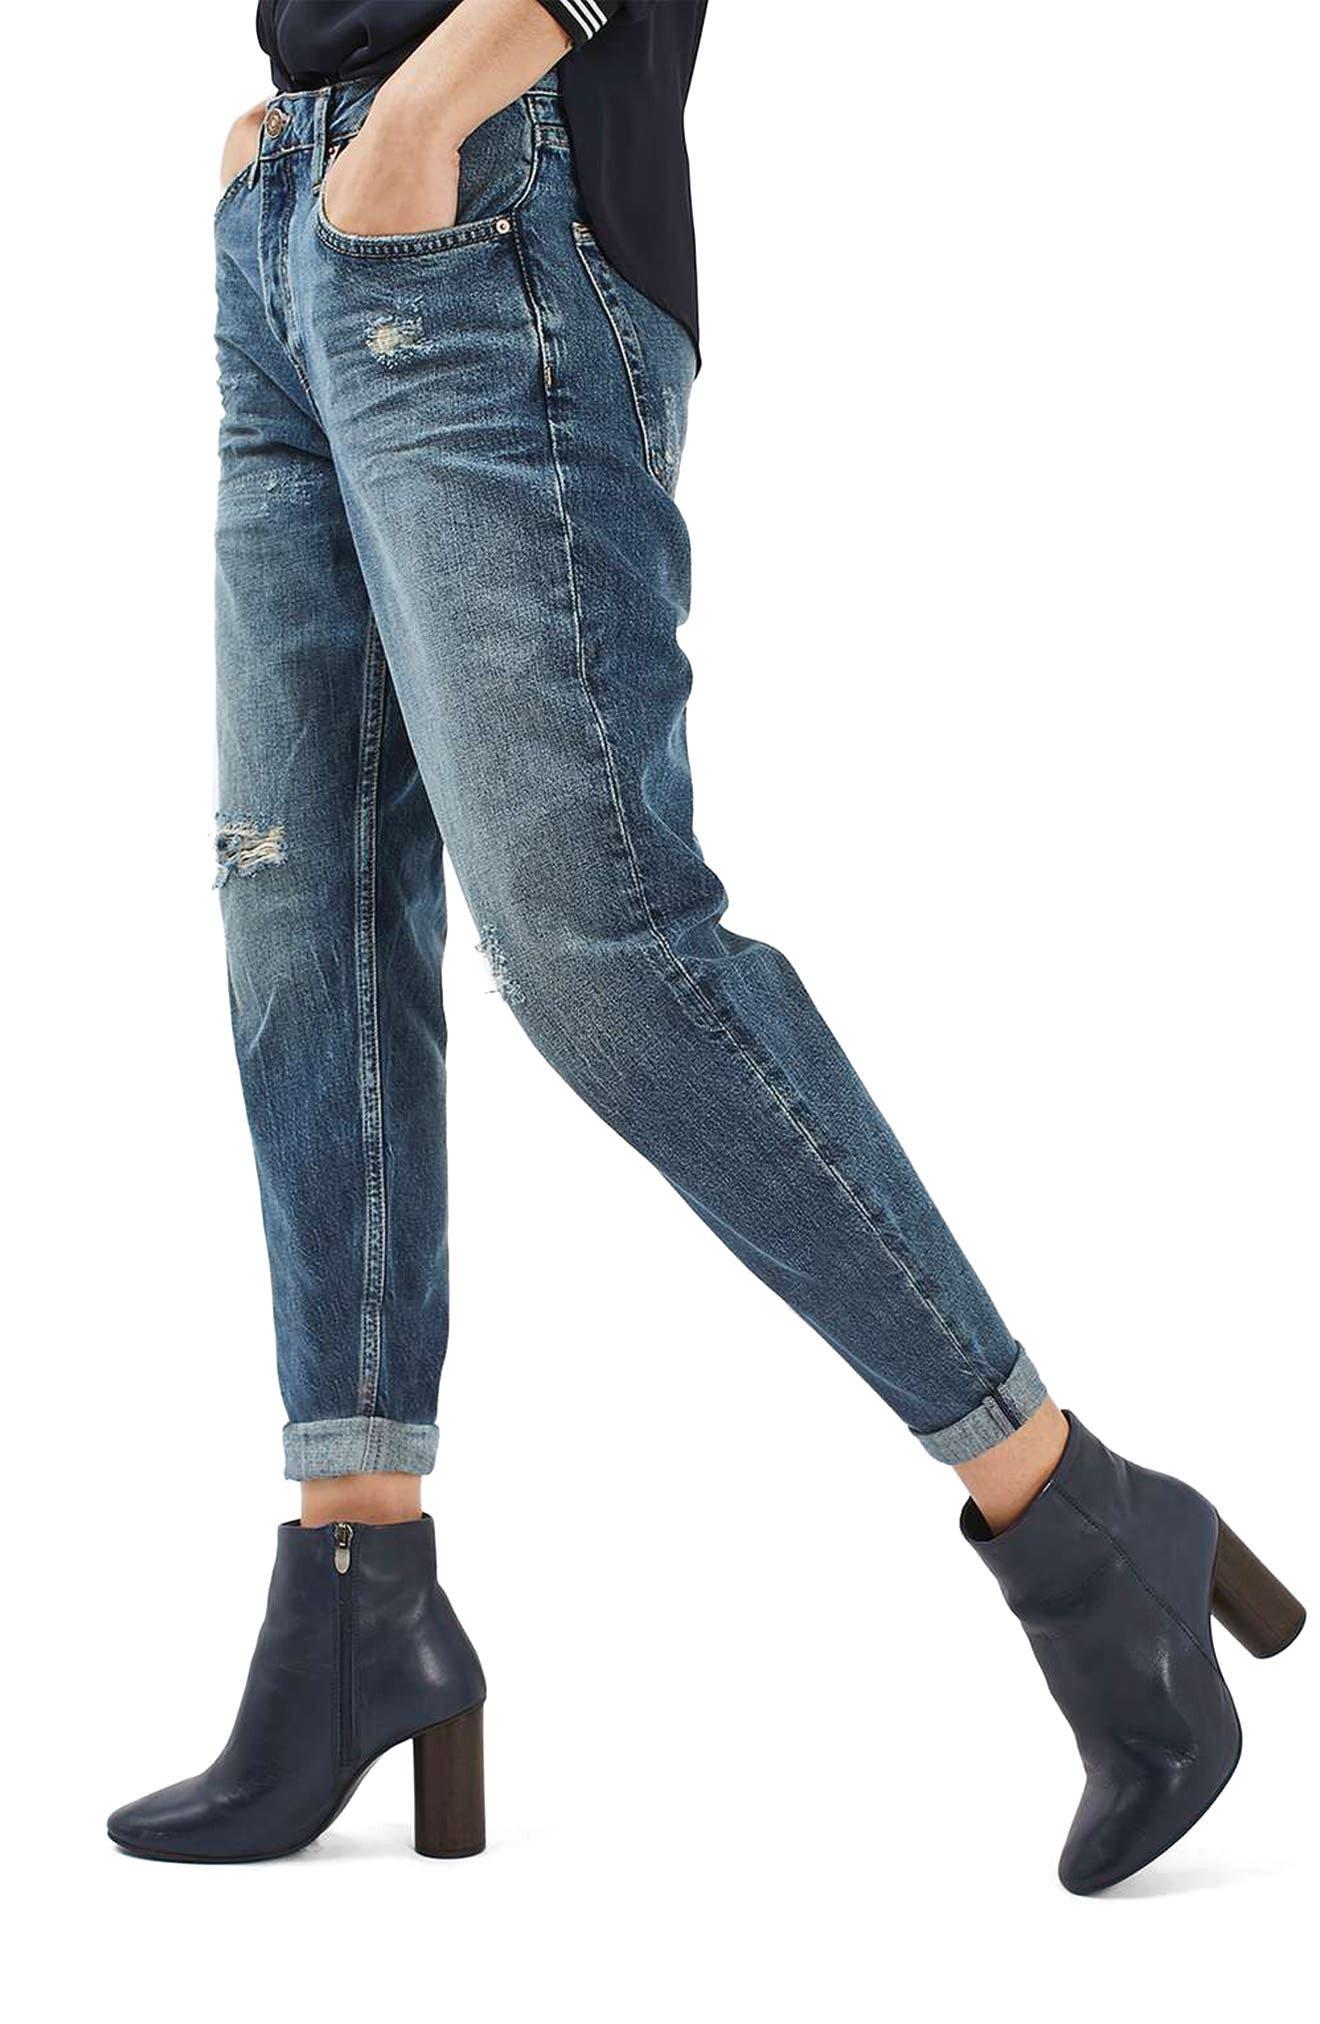 Alternate Image 1 Selected - Topshop Moto Hayden Destroyed Boyfriend Jeans (Dirty Blue)